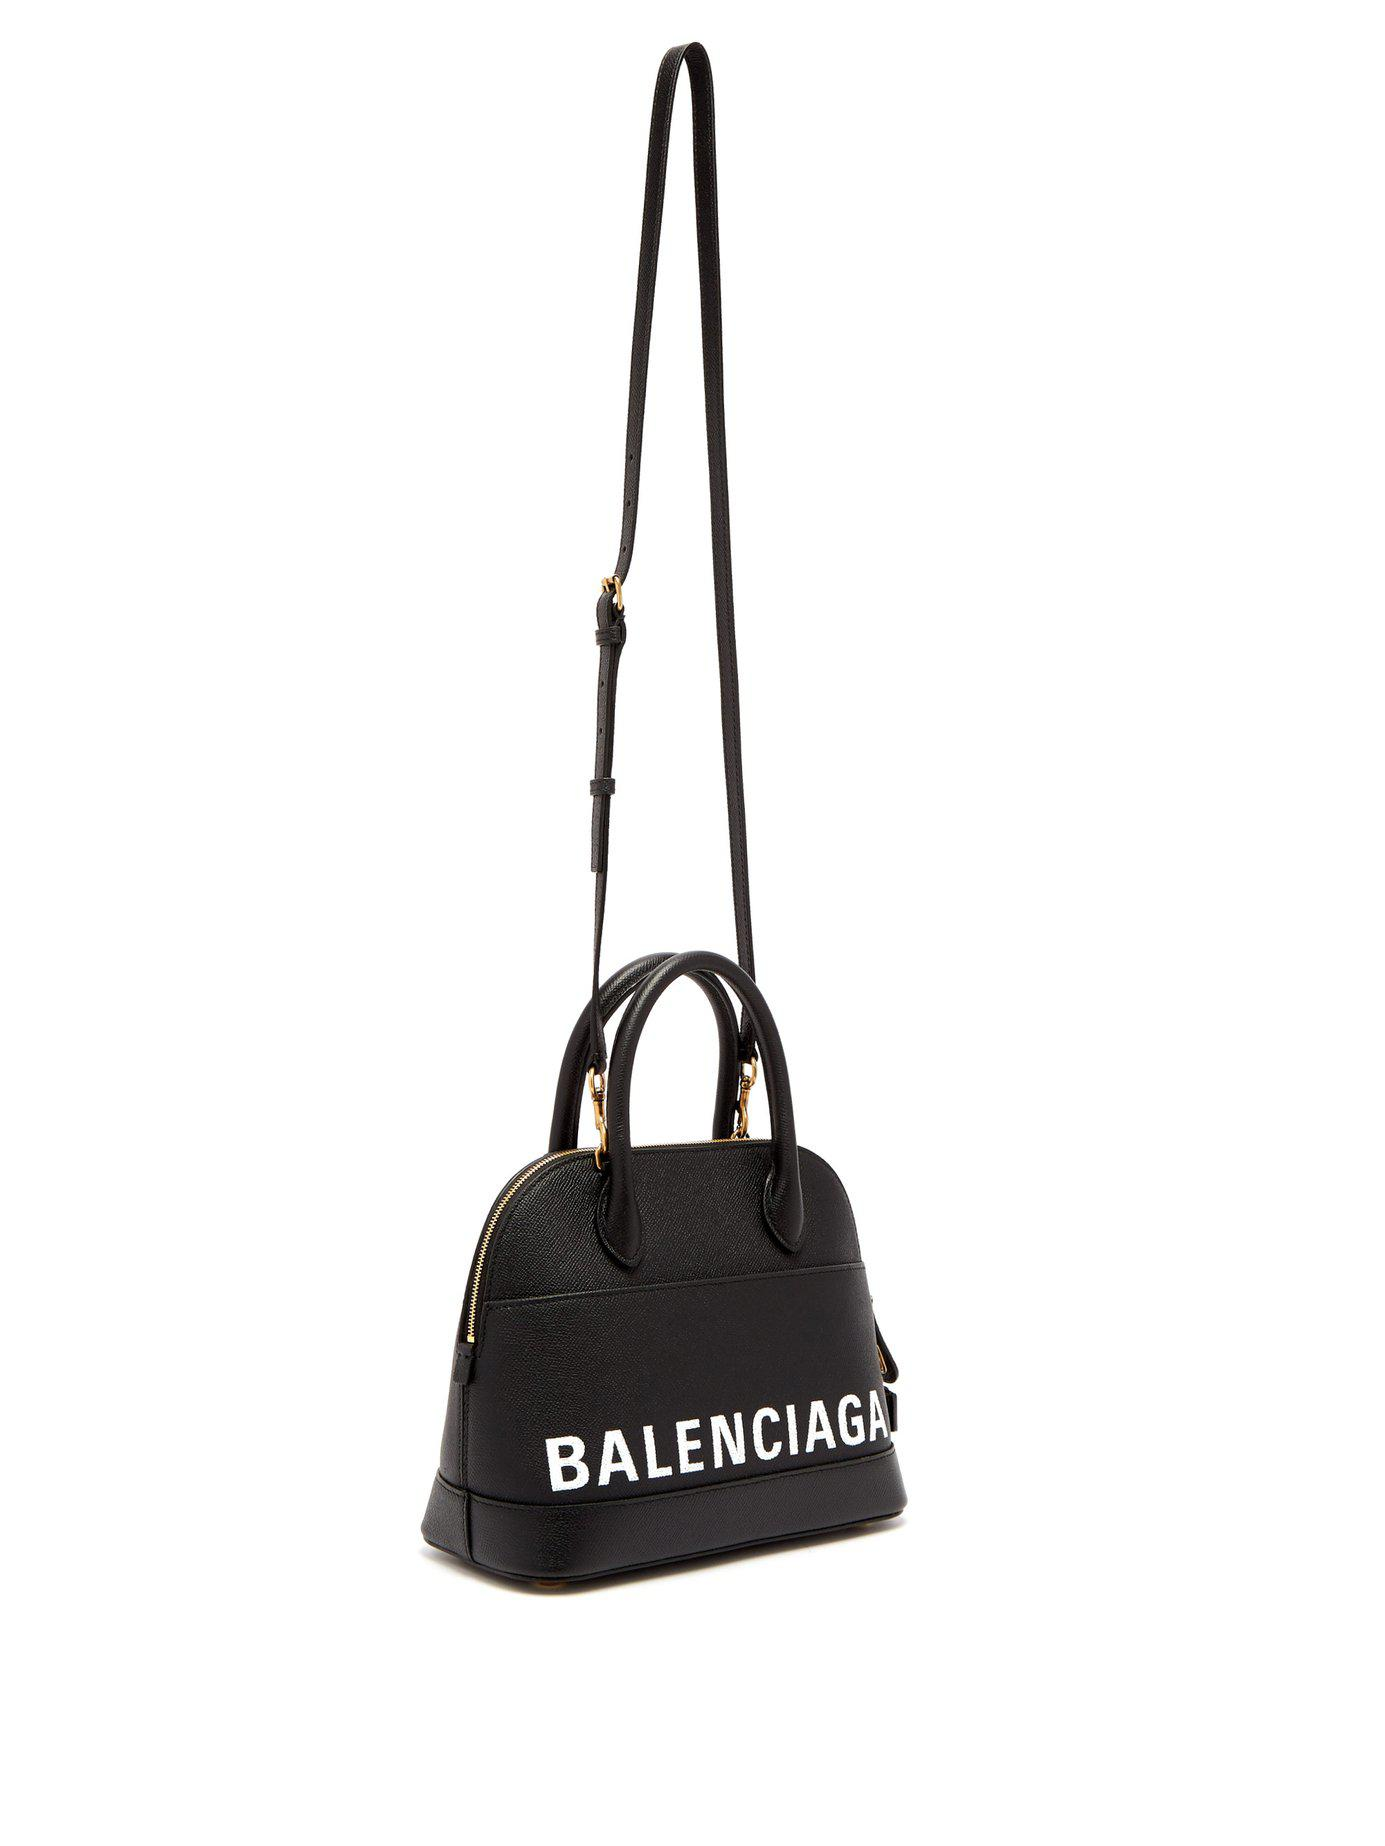 5101a44f69 Balenciaga Ville Top Handle S Bag in Black - Save 56% - Lyst